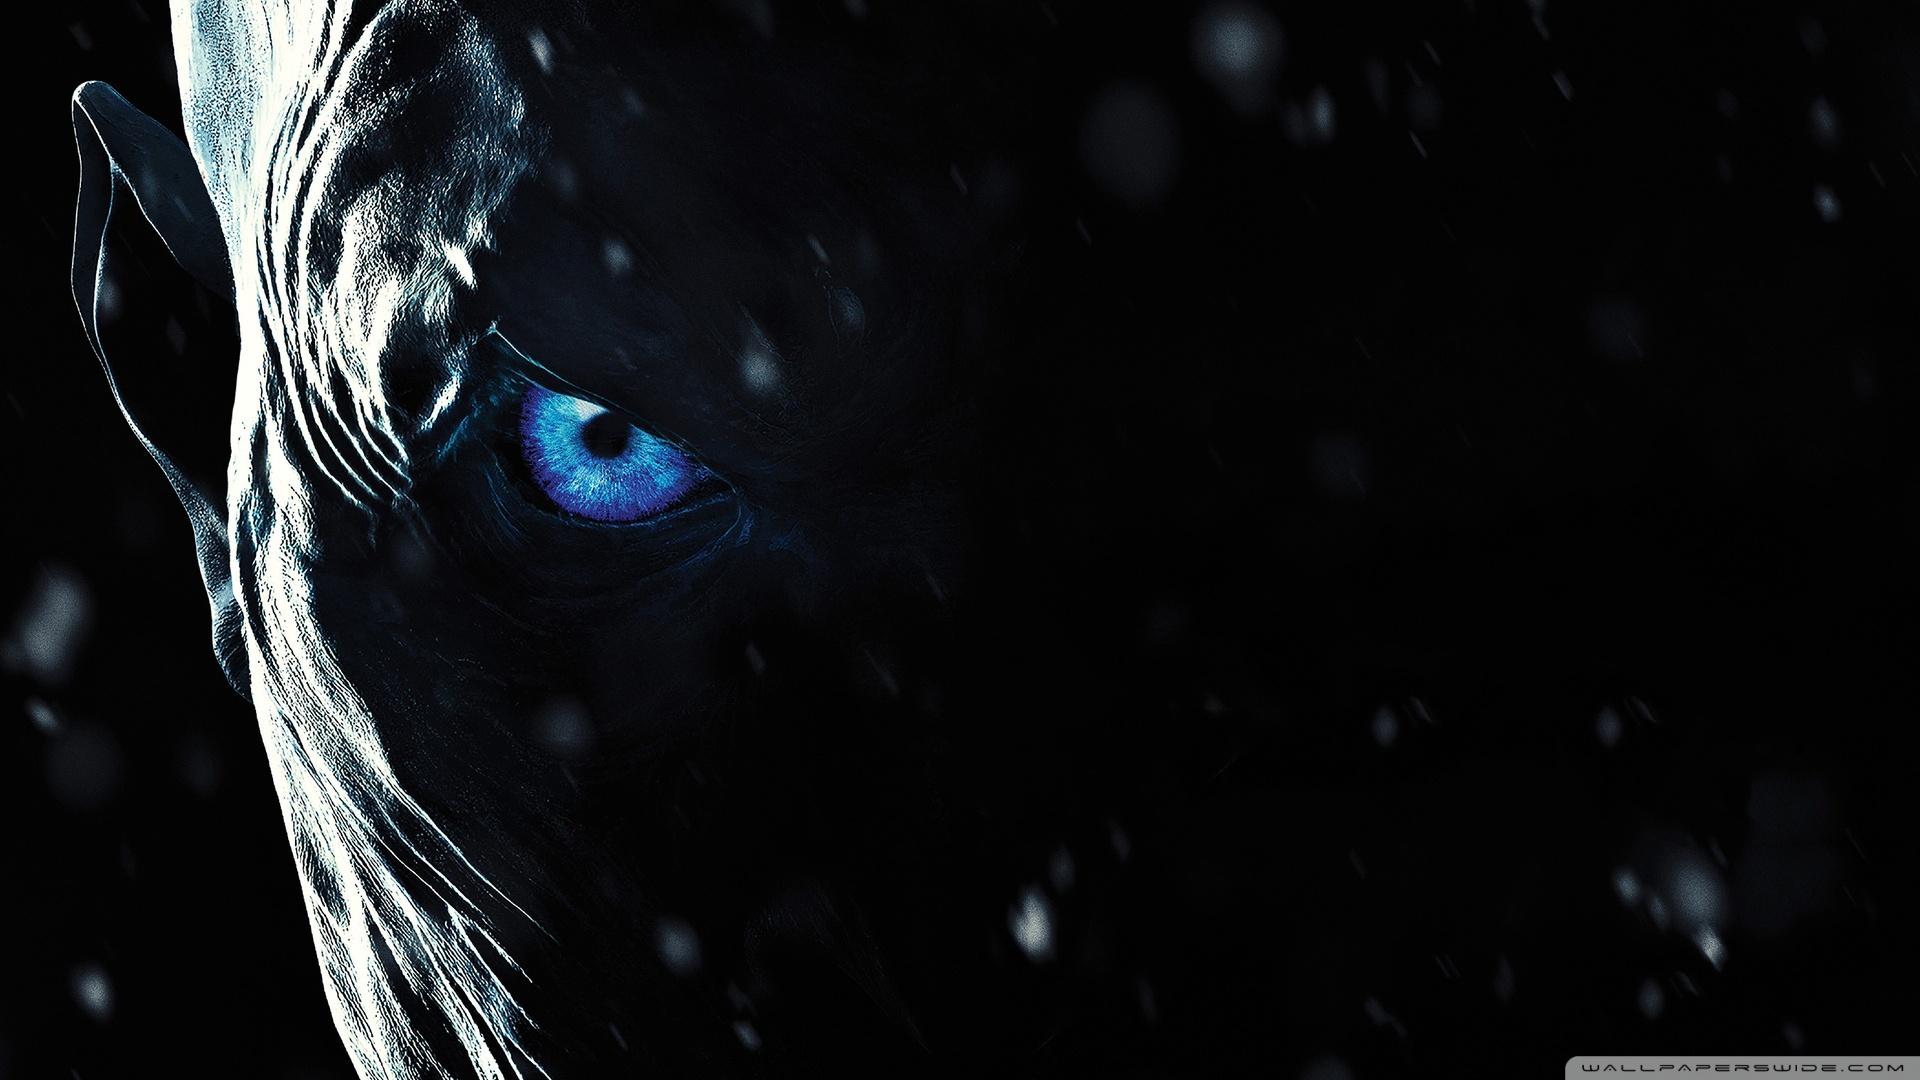 Game Of Thrones Season 7 White Walkers 4K HD Desktop Wallpaper 1920x1080